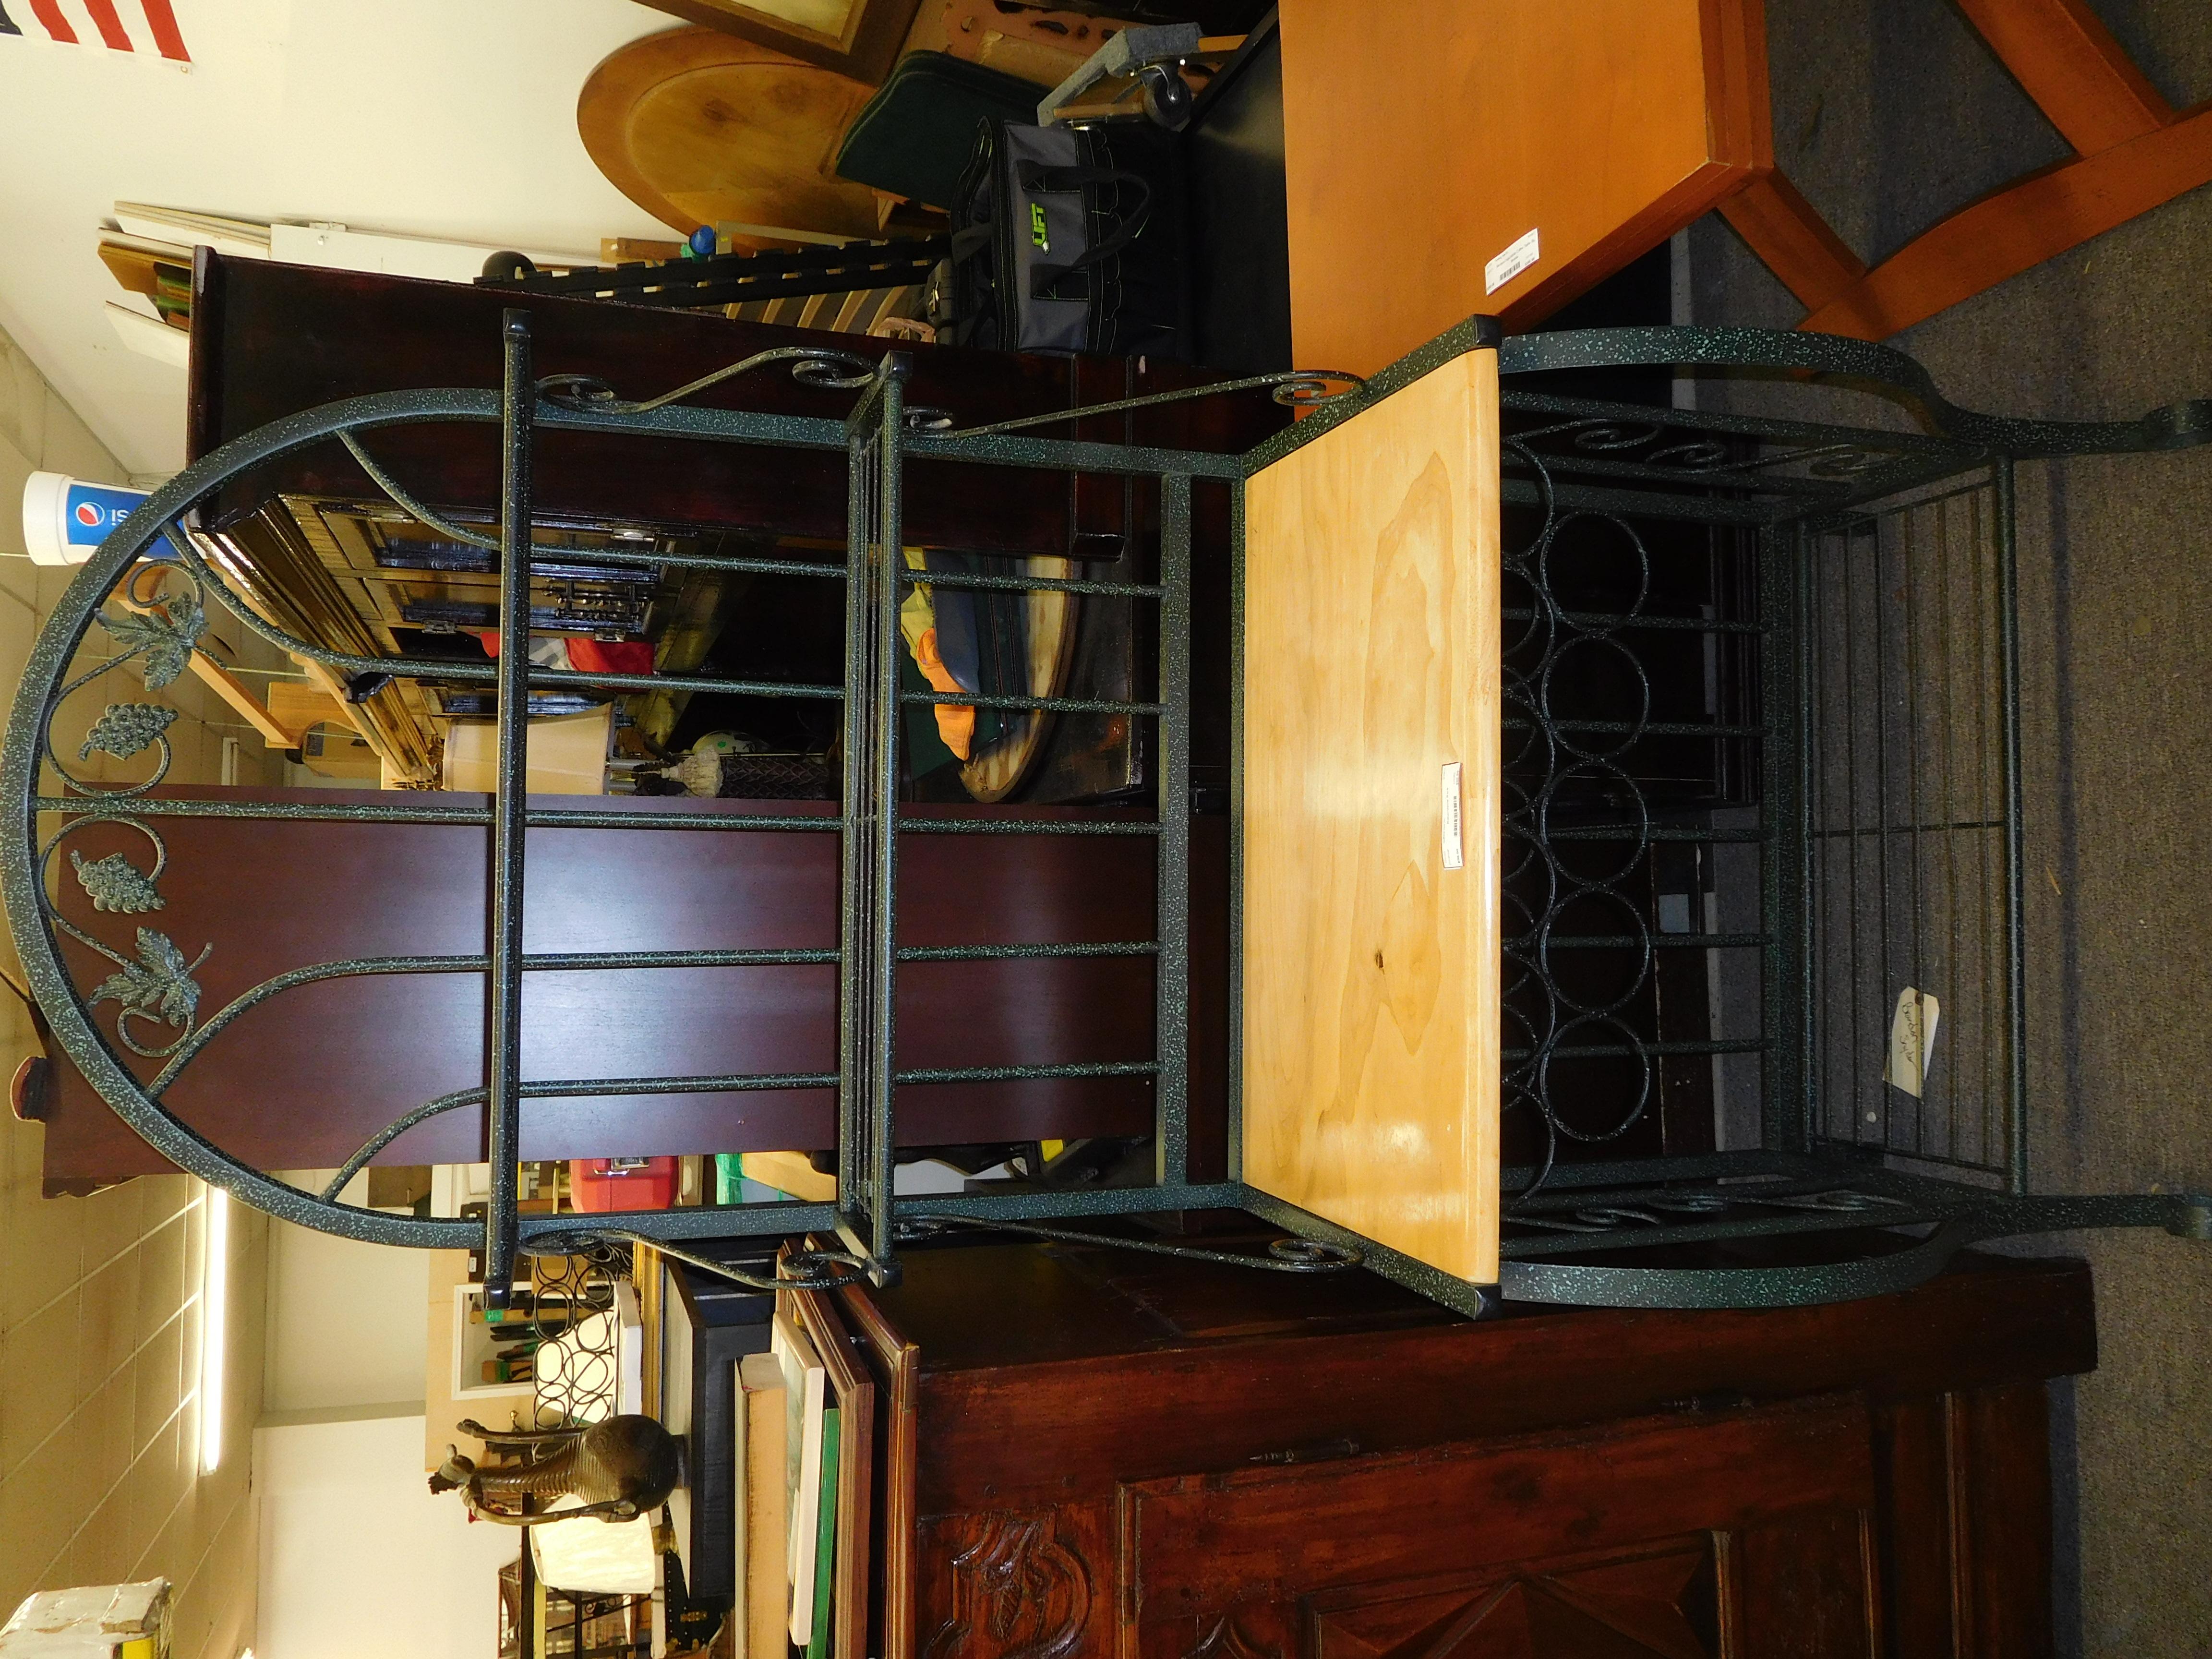 Bakers Rack with Wine Storage Below